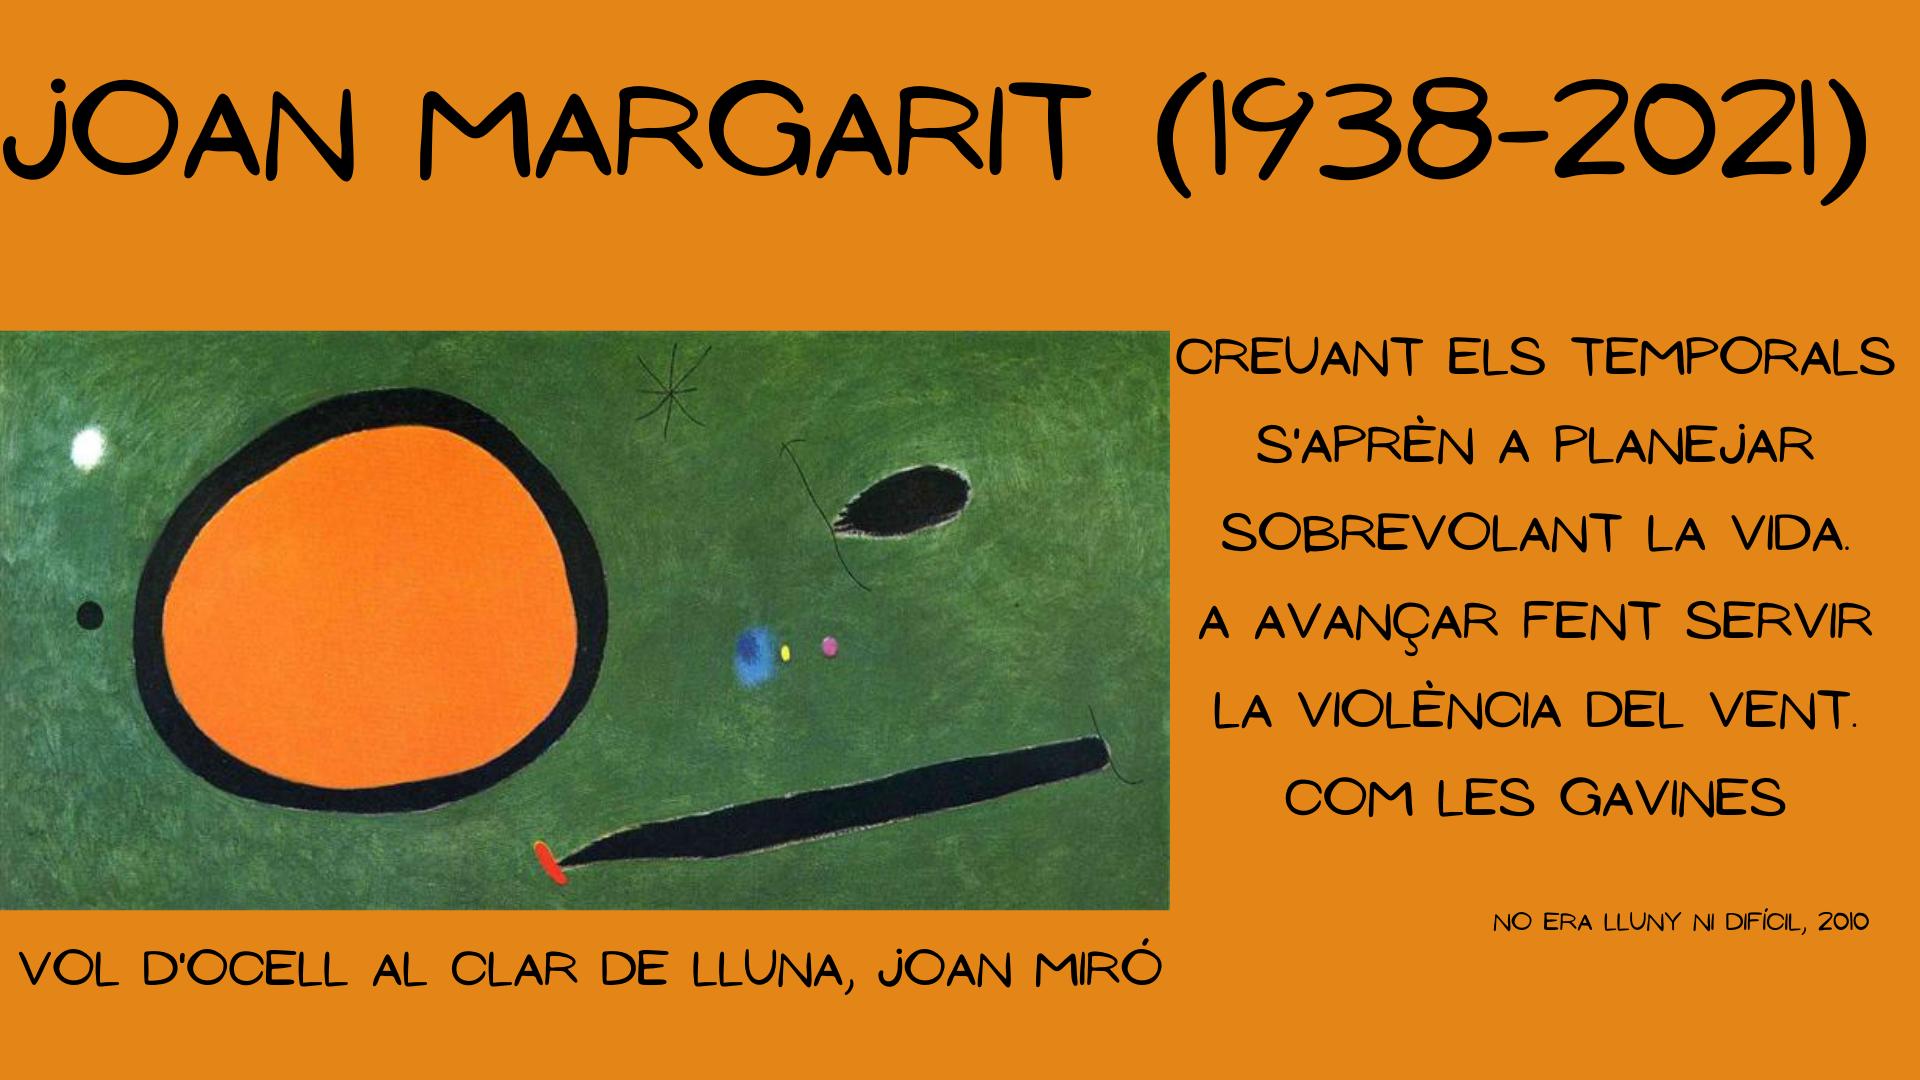 jOAN margarit (1938-2021)